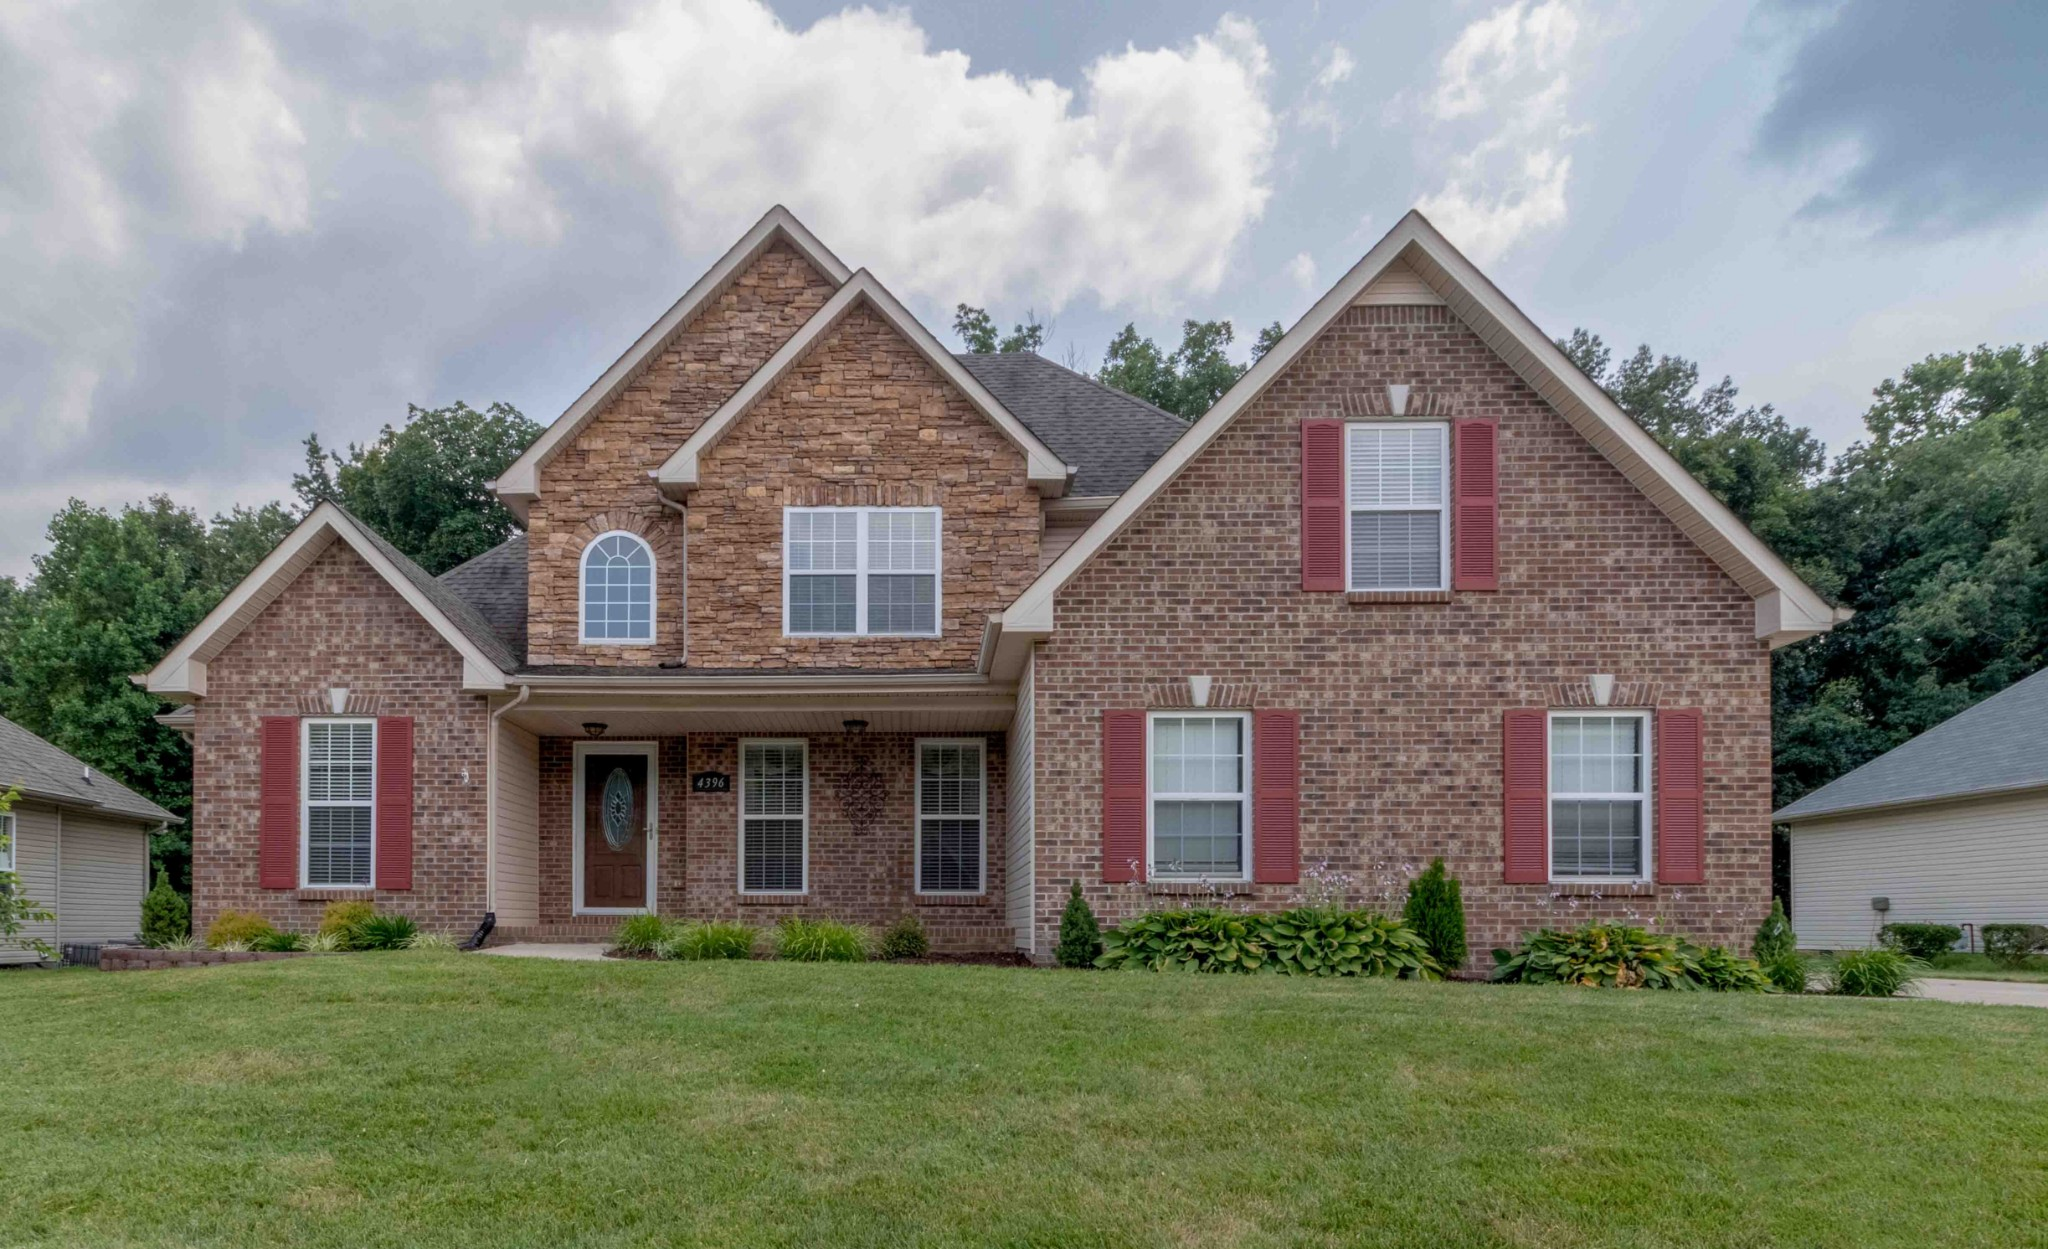 4396 Taylor Hall Ln Property Photo